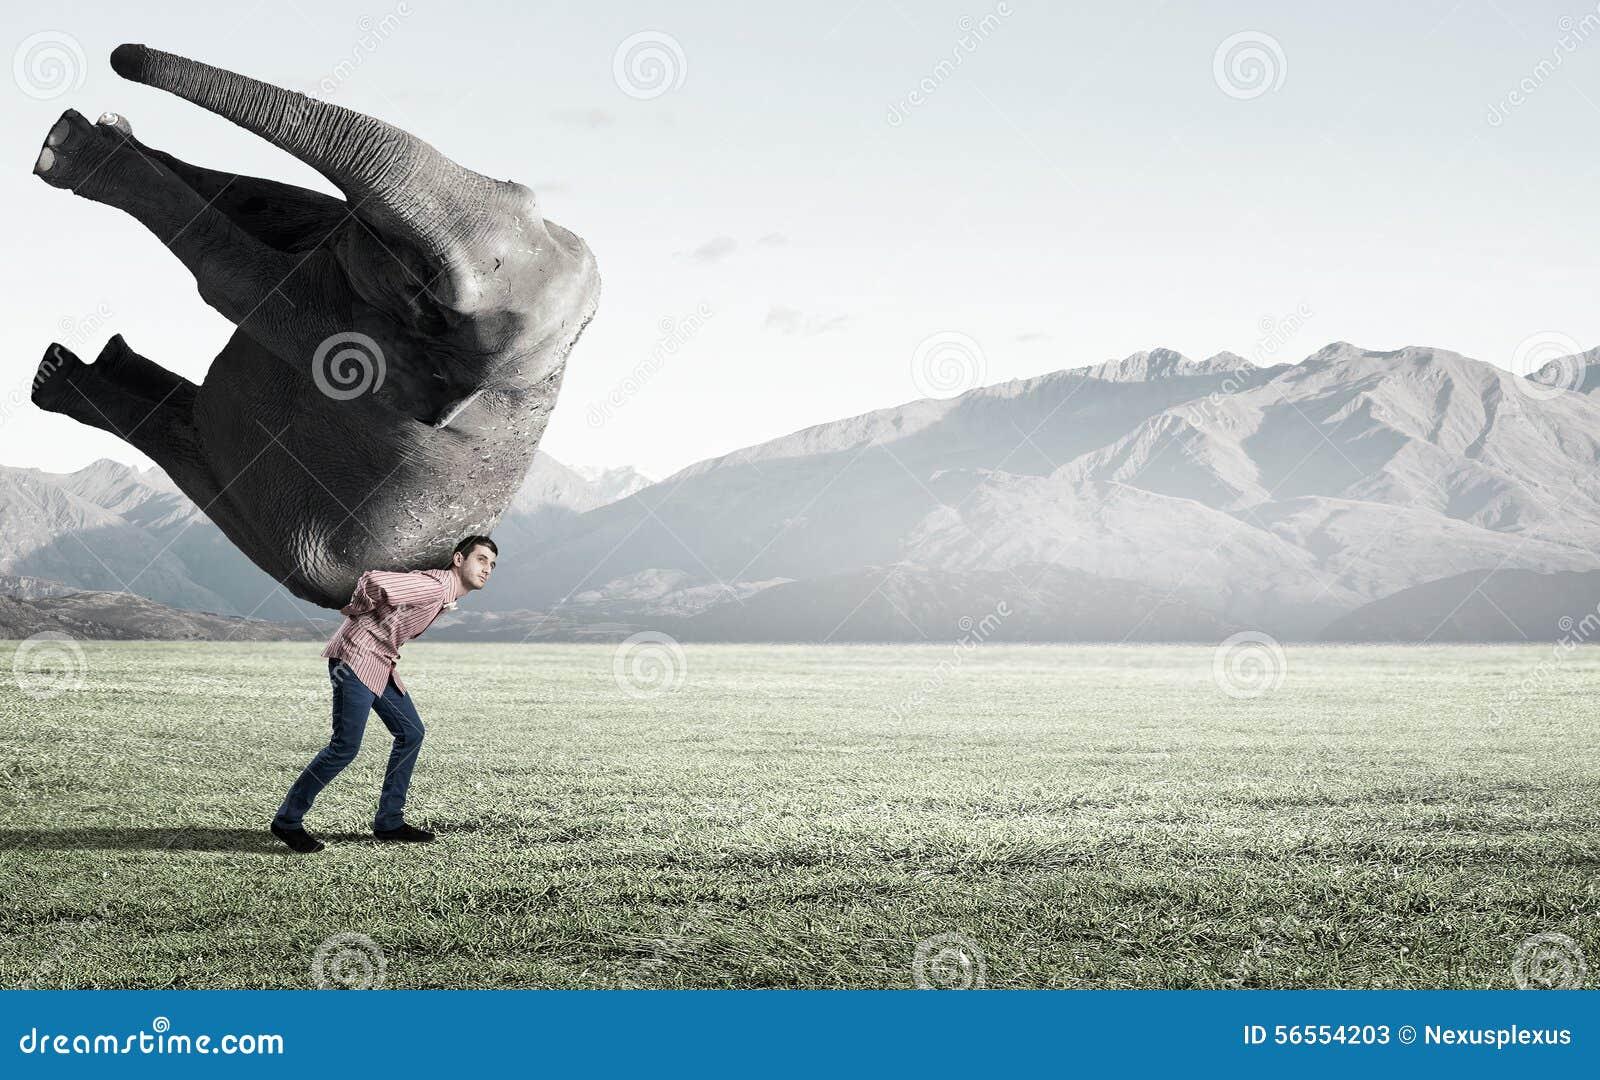 Download Το μεγάλο βάρος δεν είναι πρόβλημα Στοκ Εικόνα - εικόνα από μεγάλη, αρσενικό: 56554203